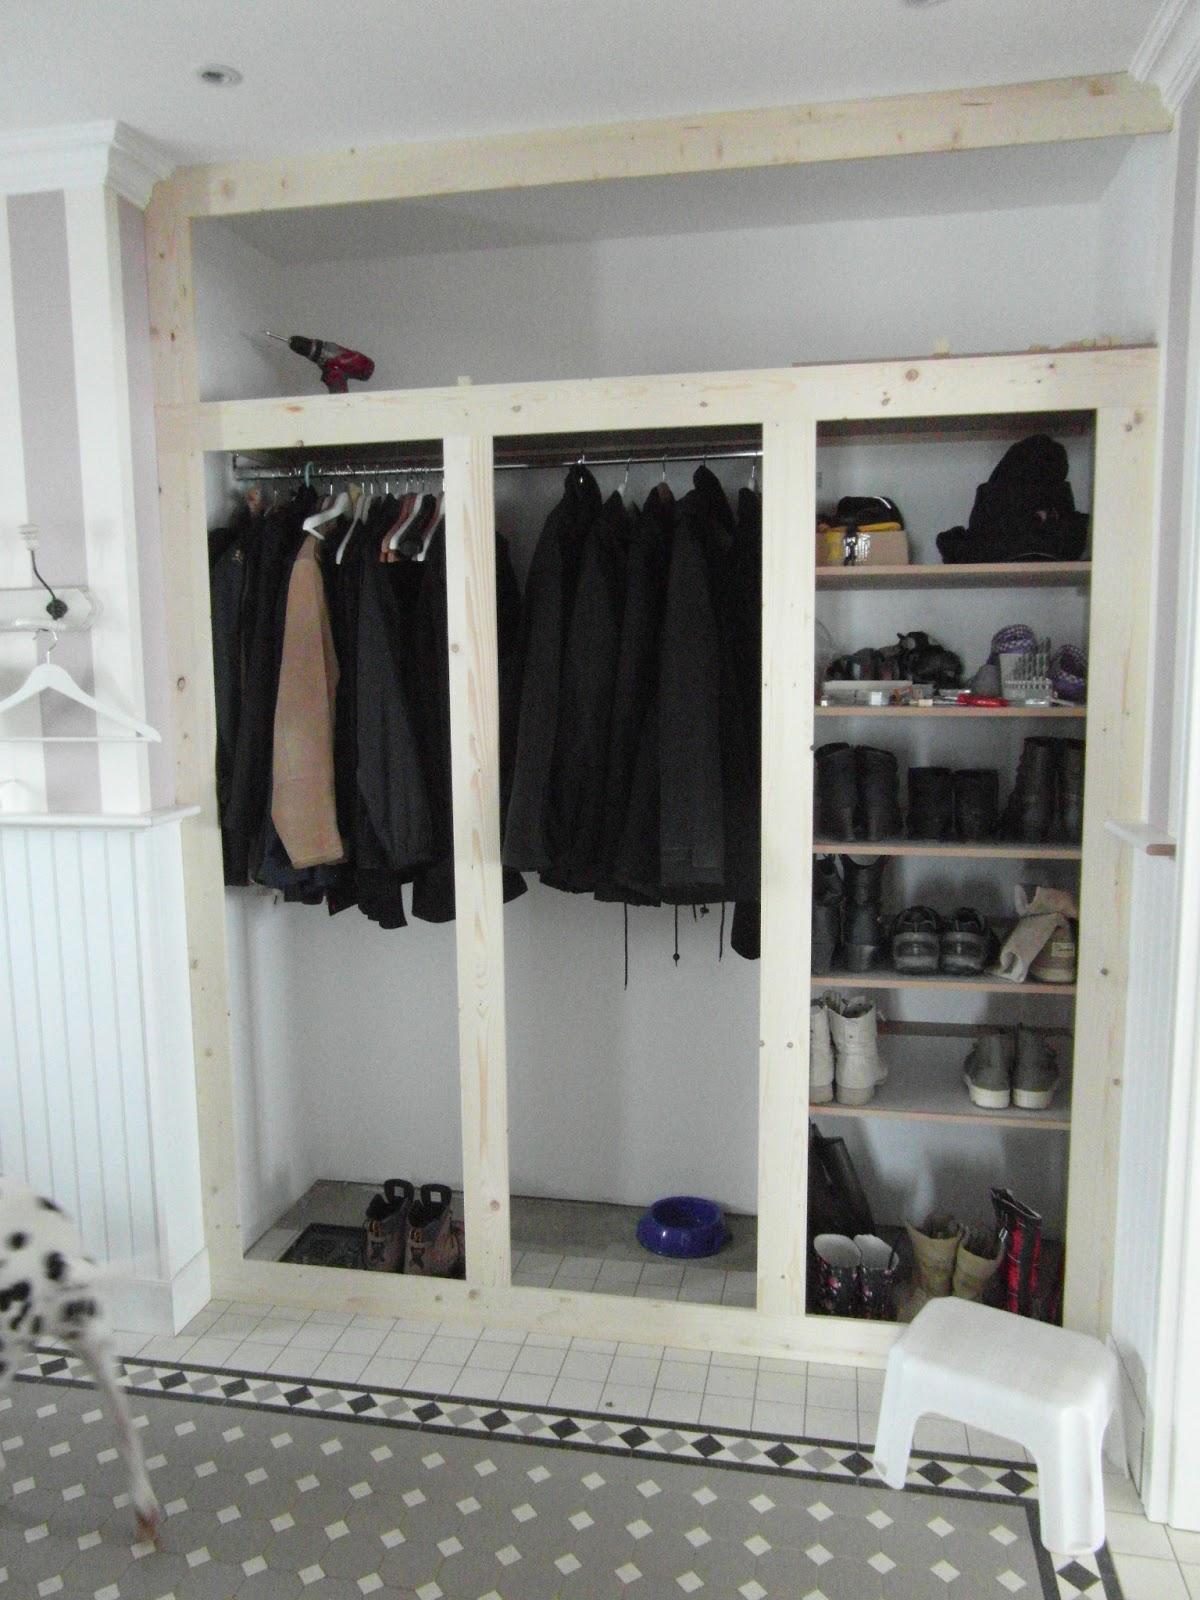 valn t hus einbauschrank. Black Bedroom Furniture Sets. Home Design Ideas